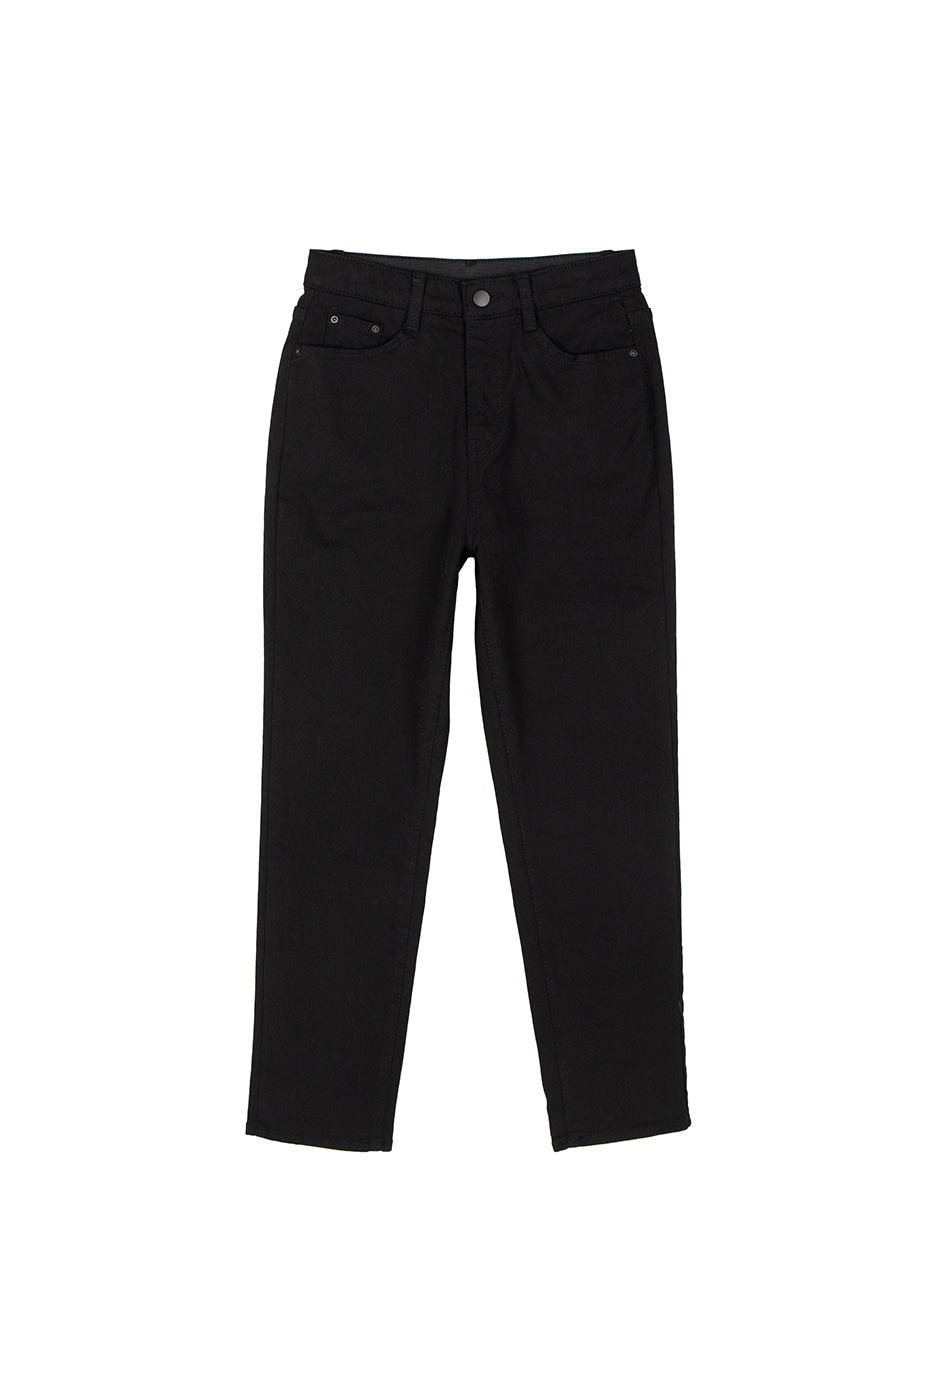 Border casual pants